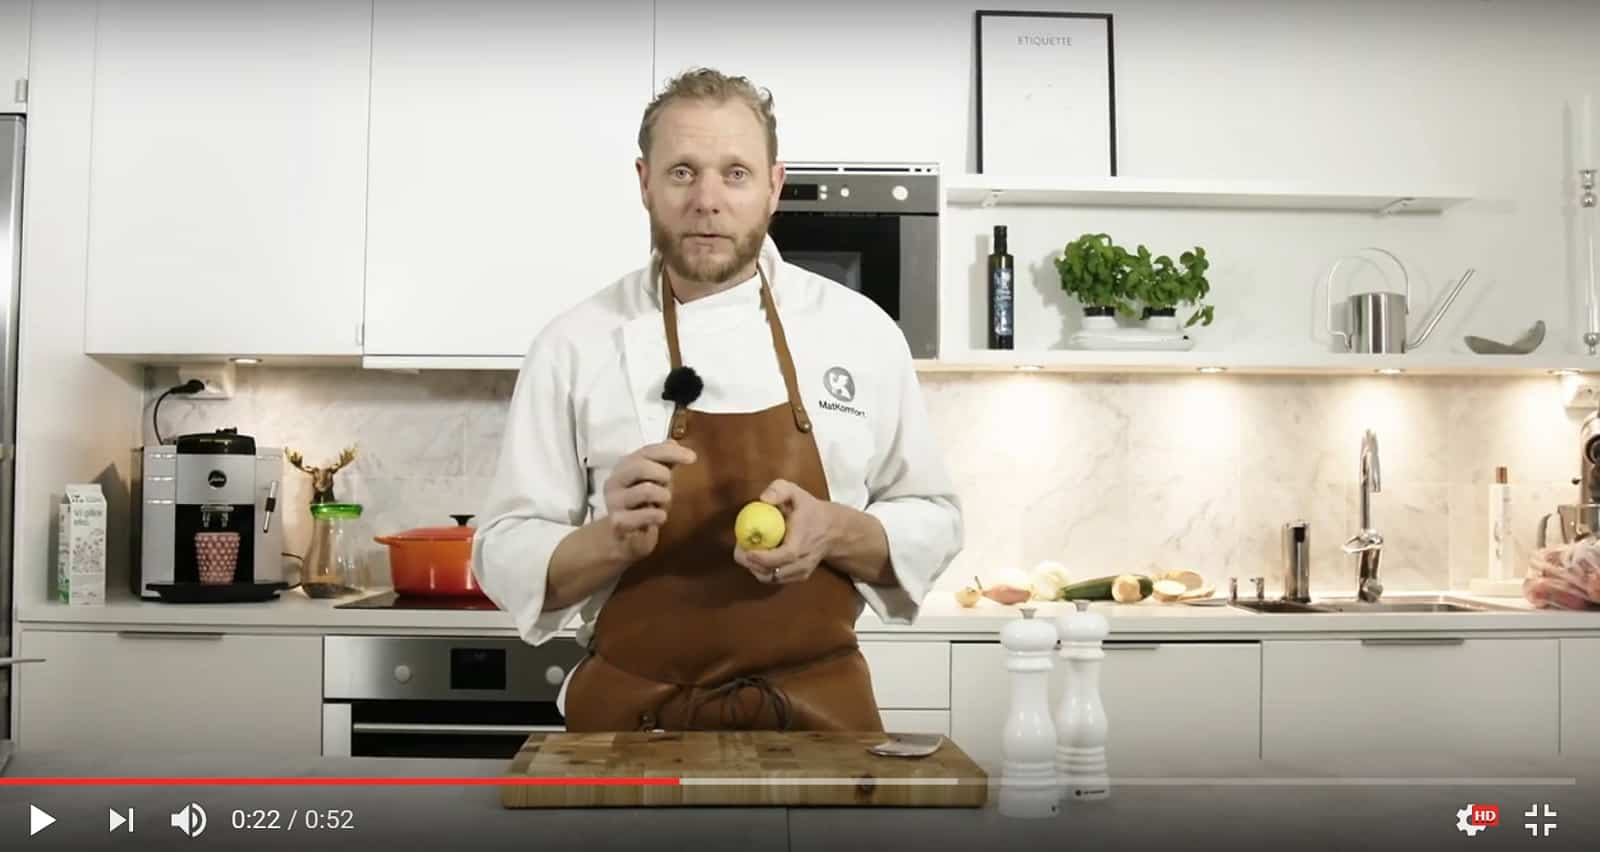 Filmtips hur du river citron